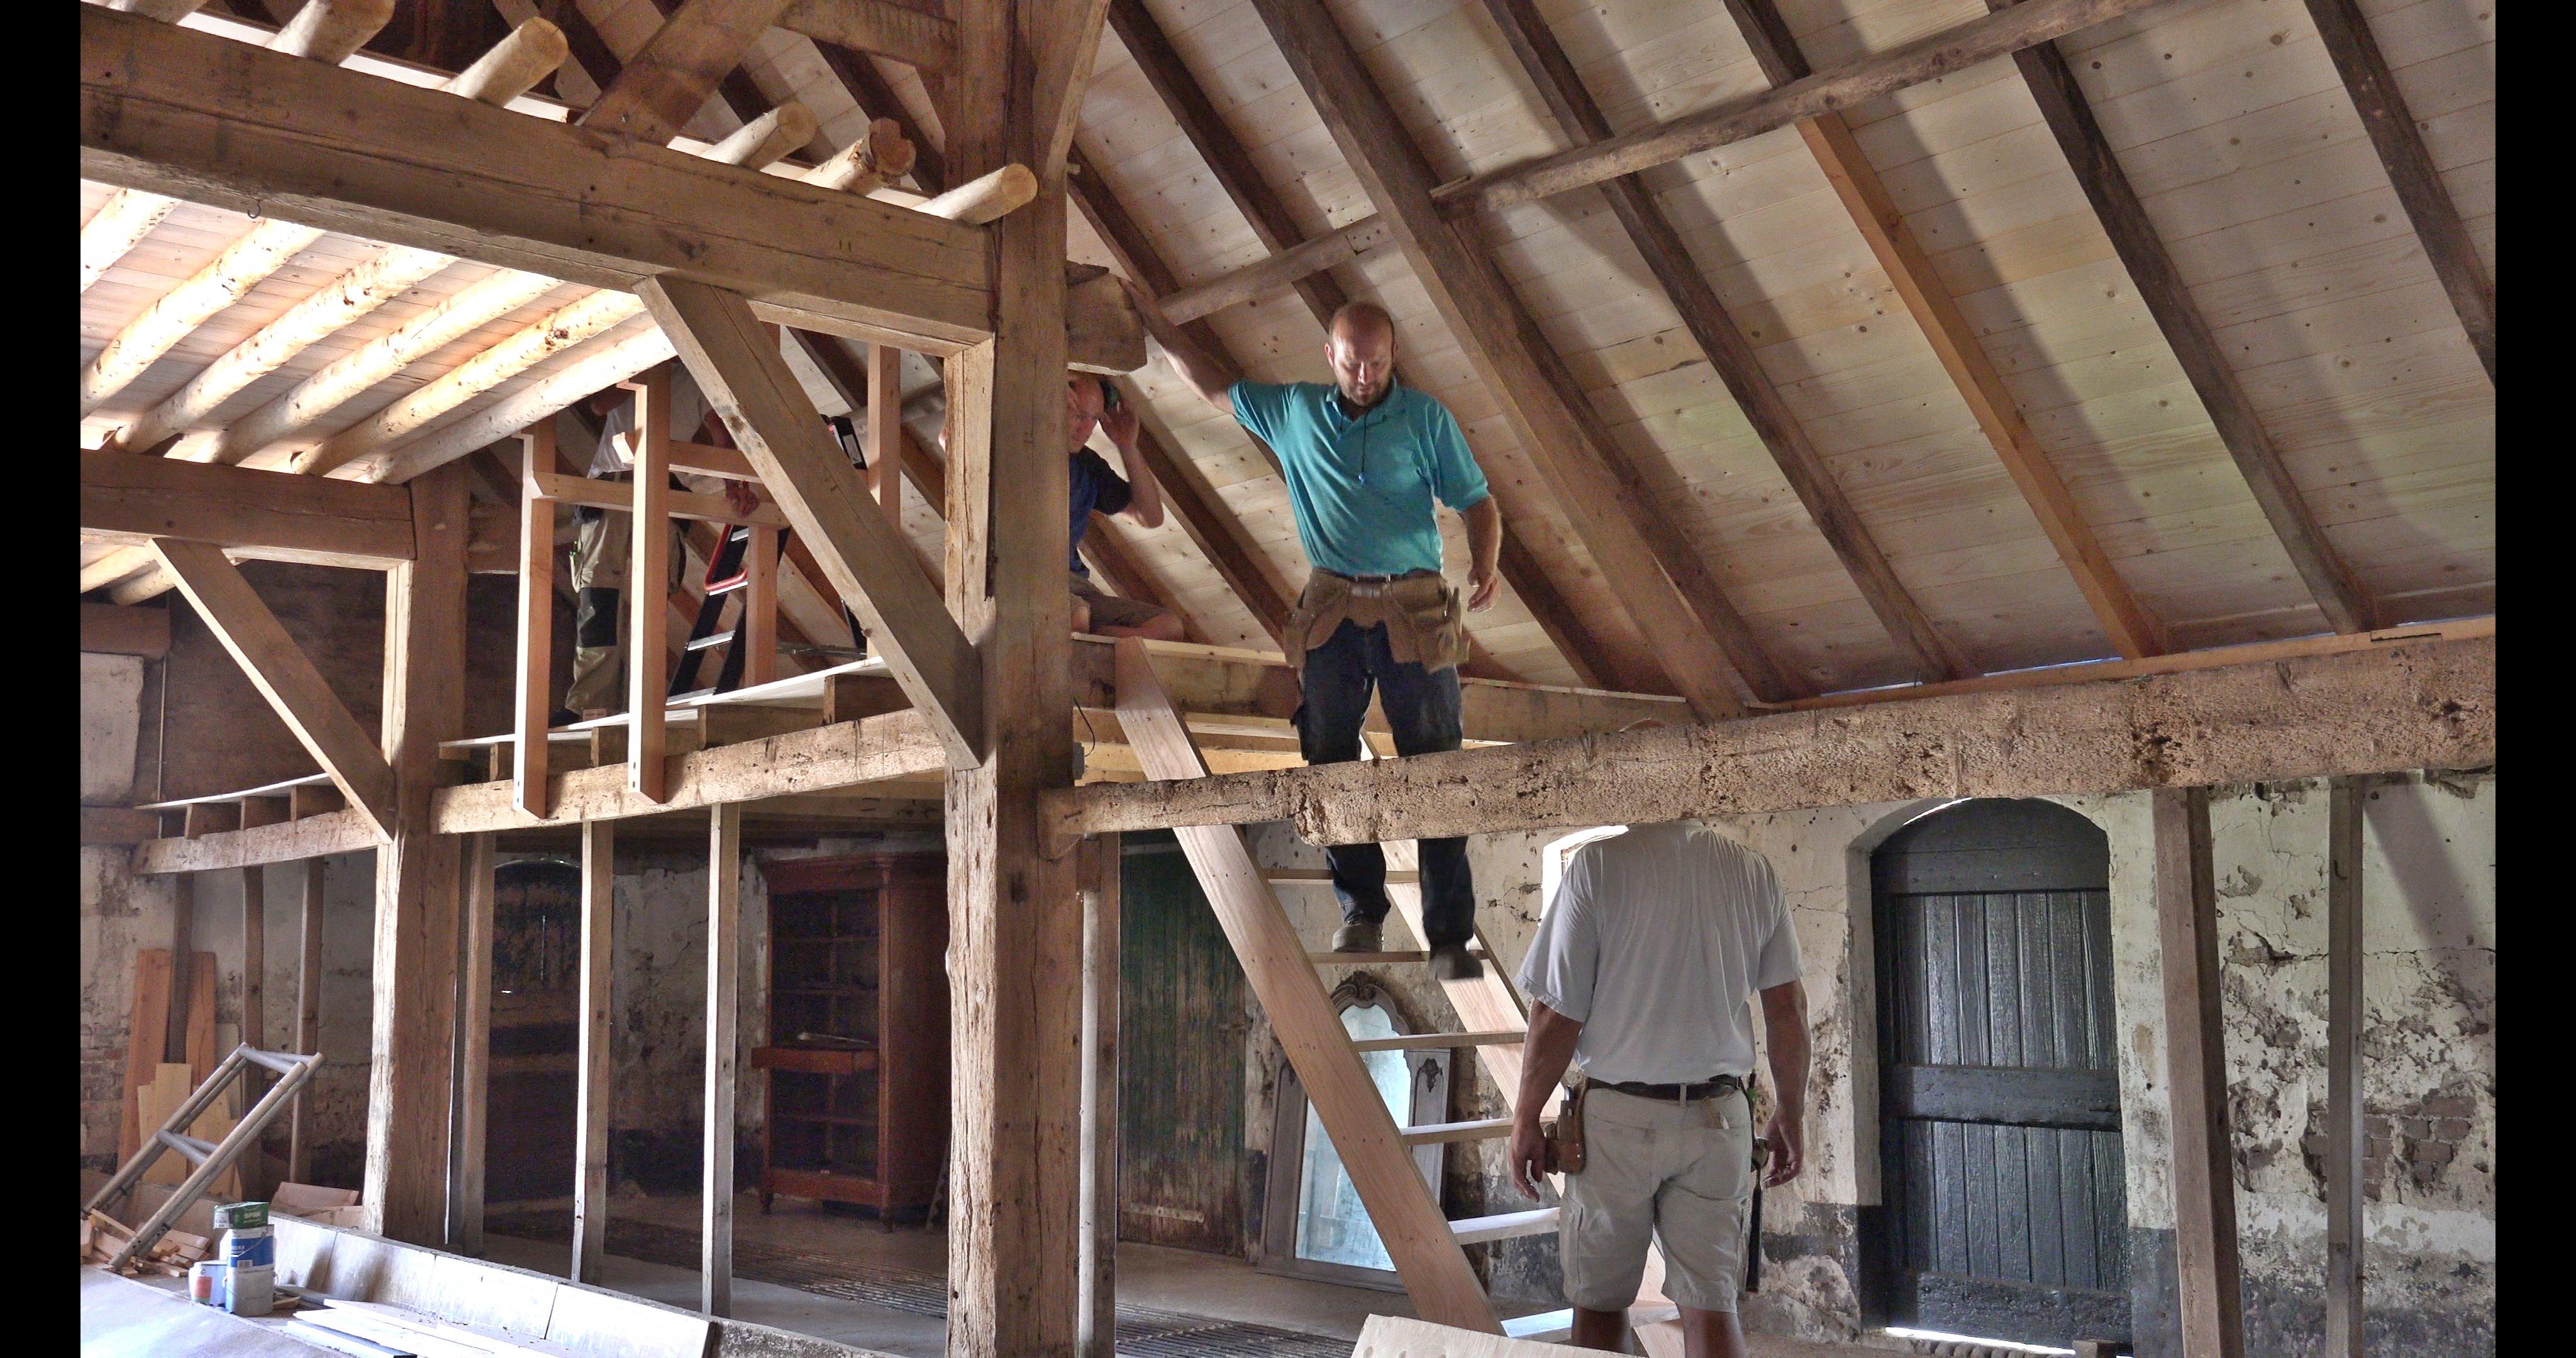 Fred test de trap naar de hilde.